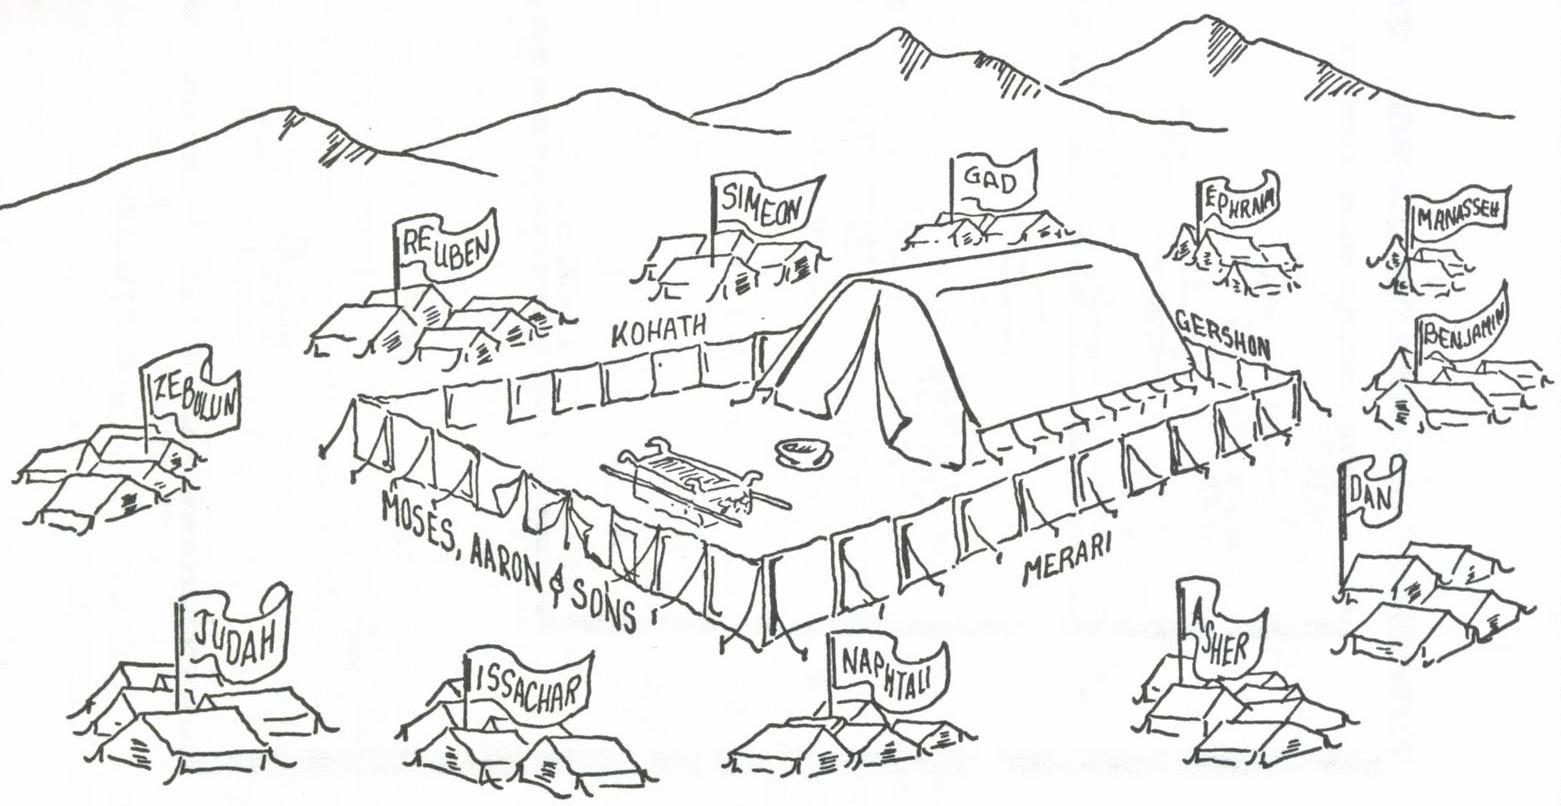 Hebrew Tabernacle Diagram